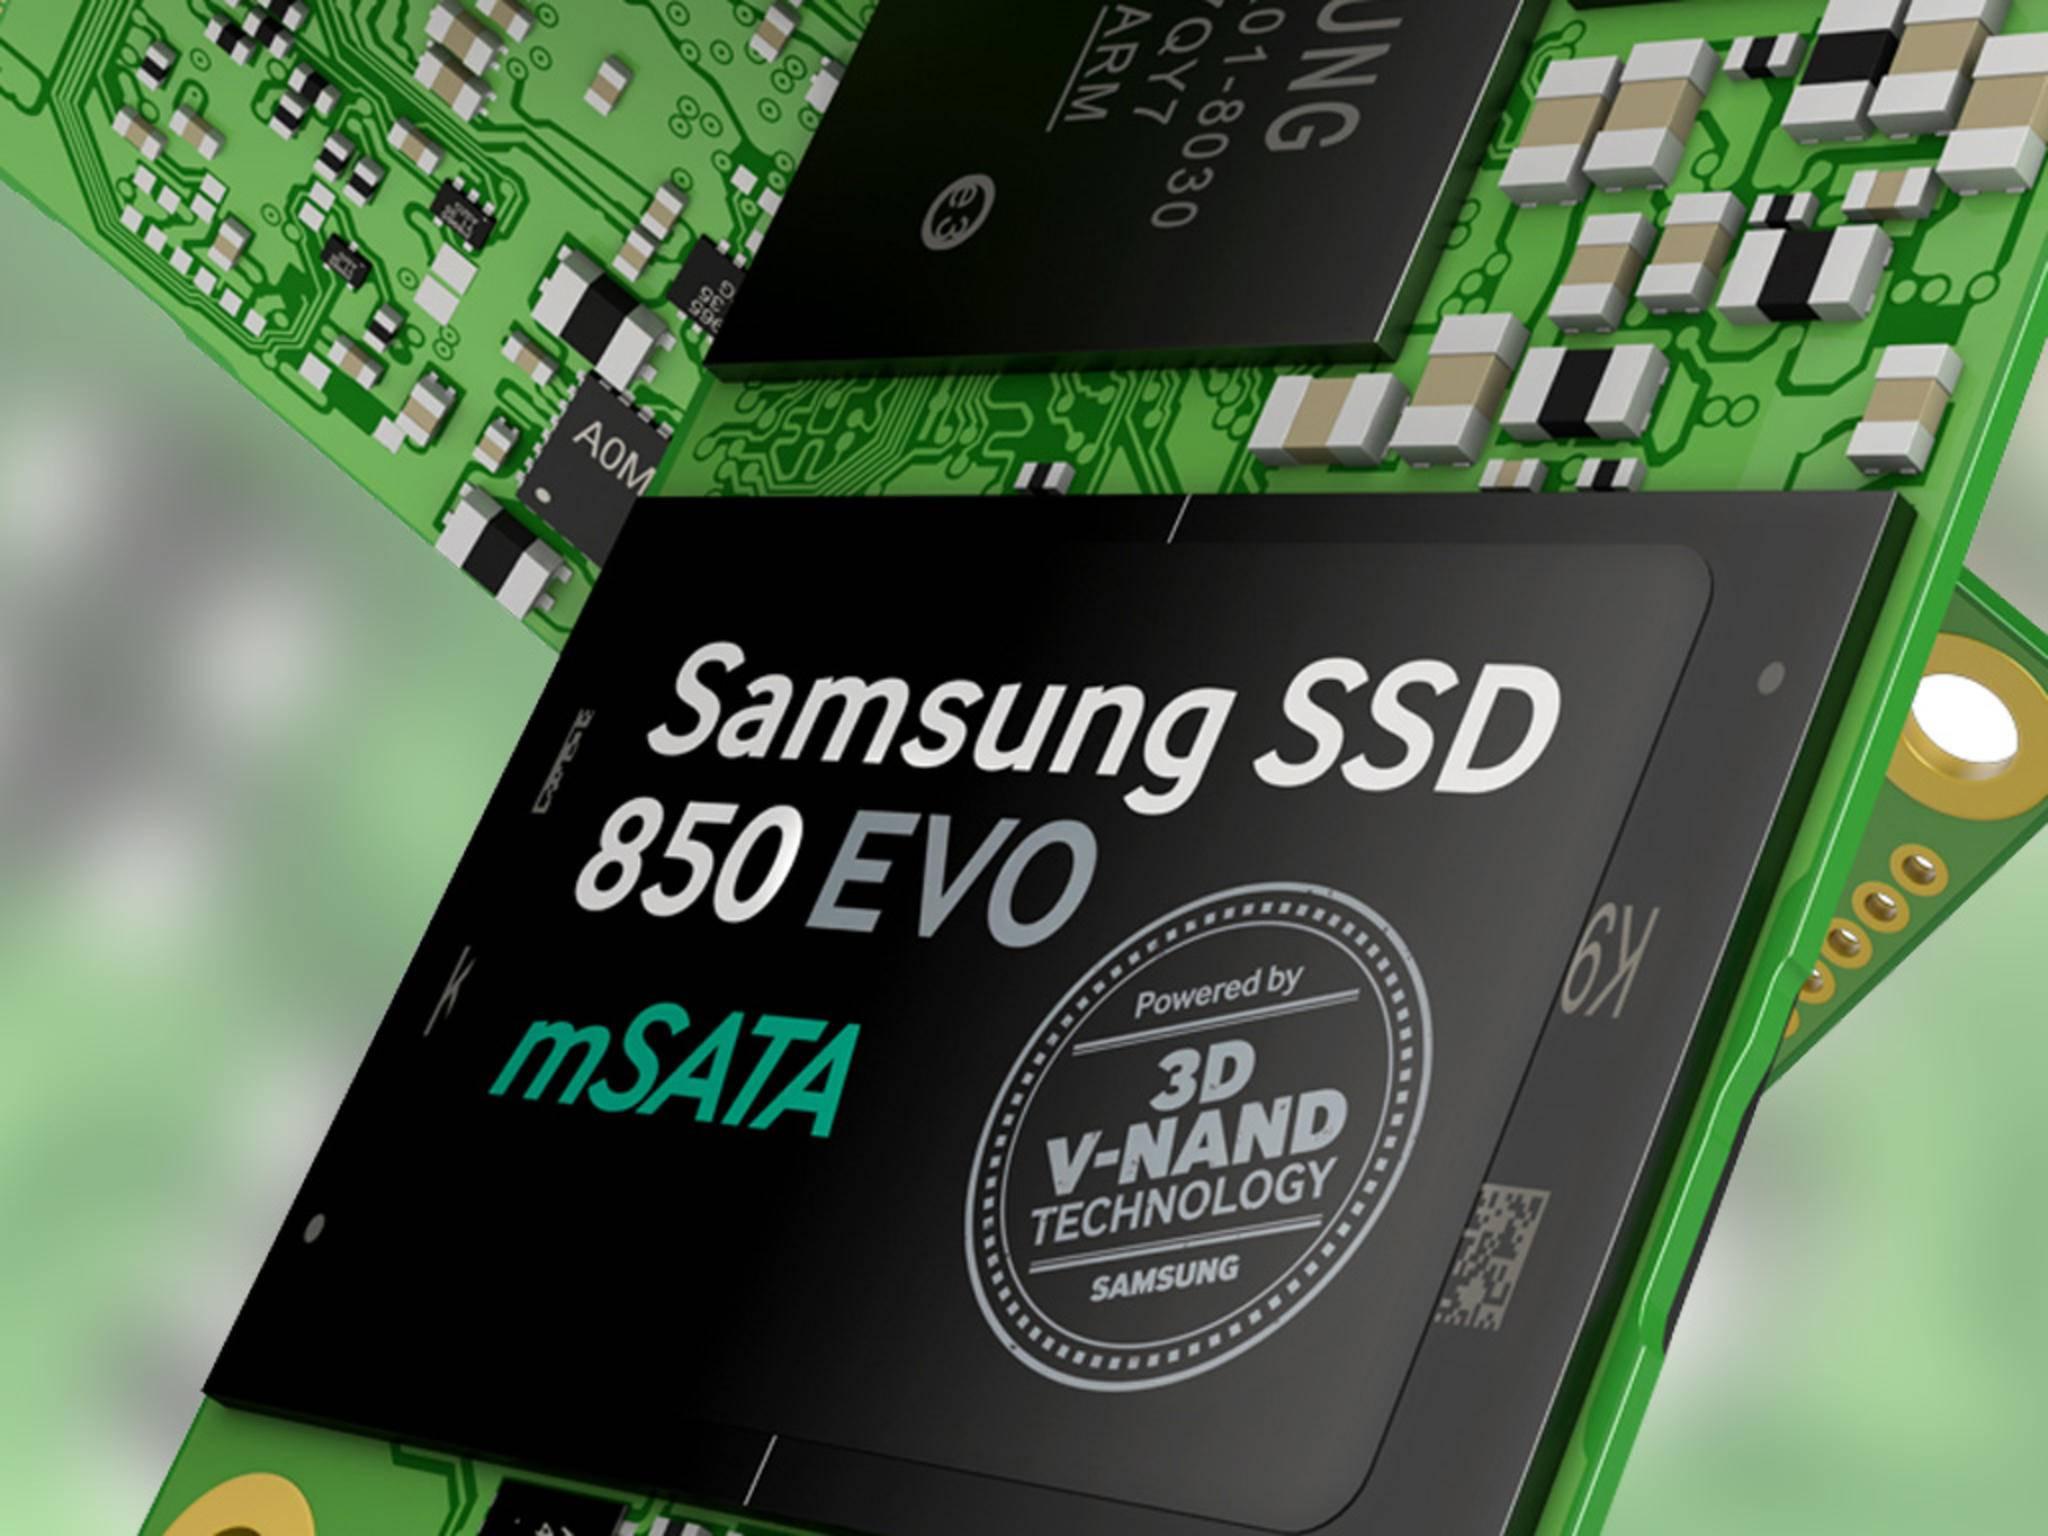 Samsung SSD Festplatte